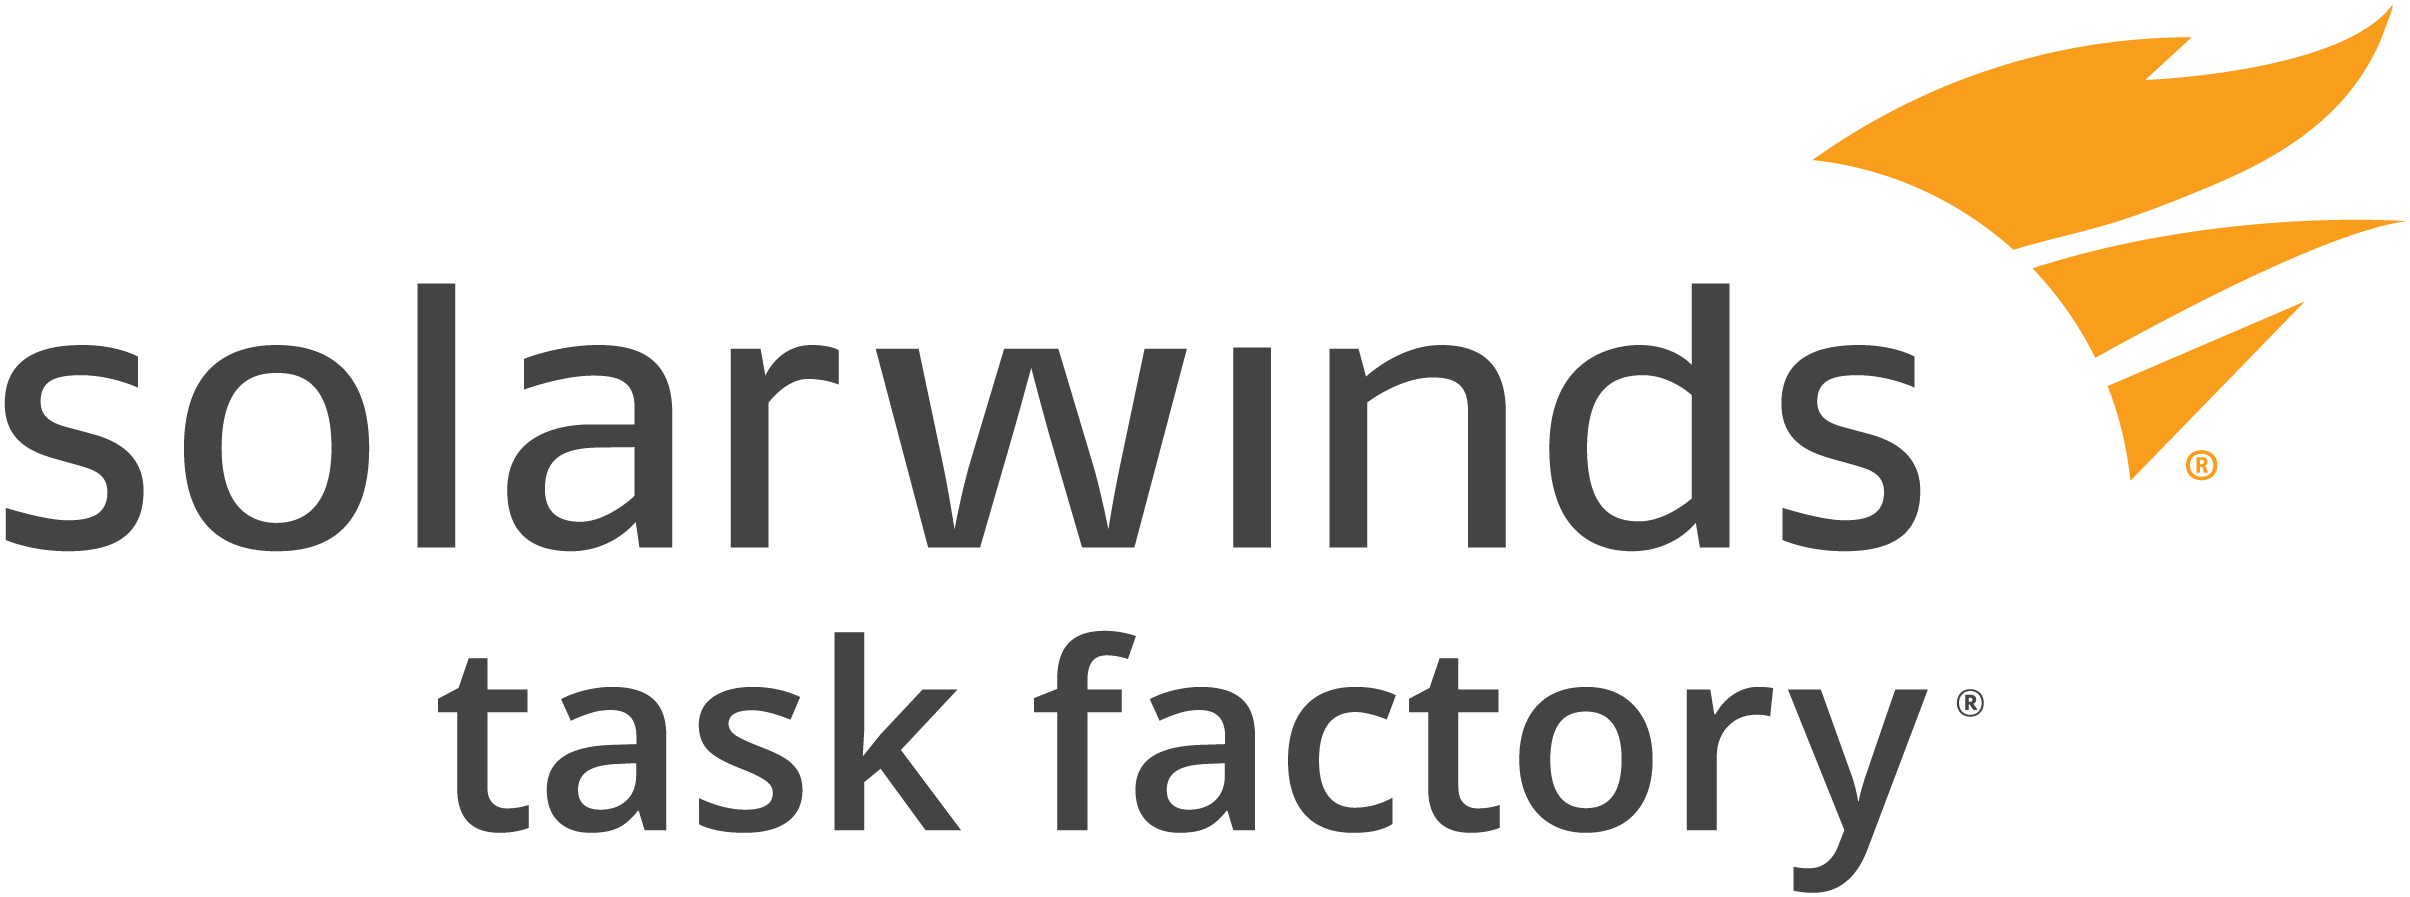 Task Factory